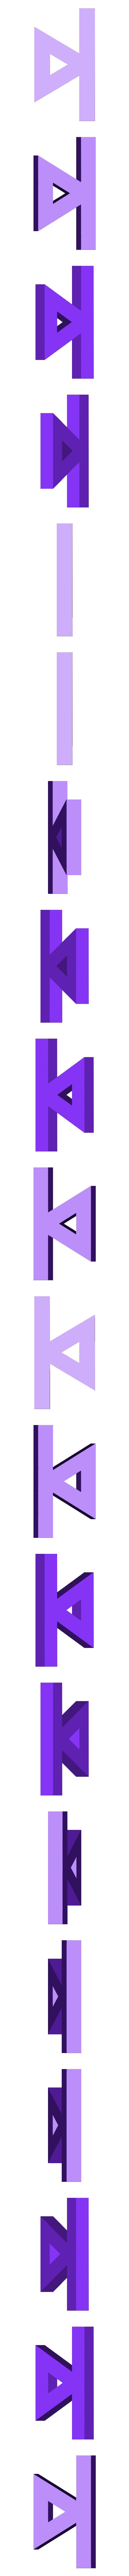 WakandaFont-Z.stl Download free STL file Wakandan Font • Model to 3D print, hterefenko